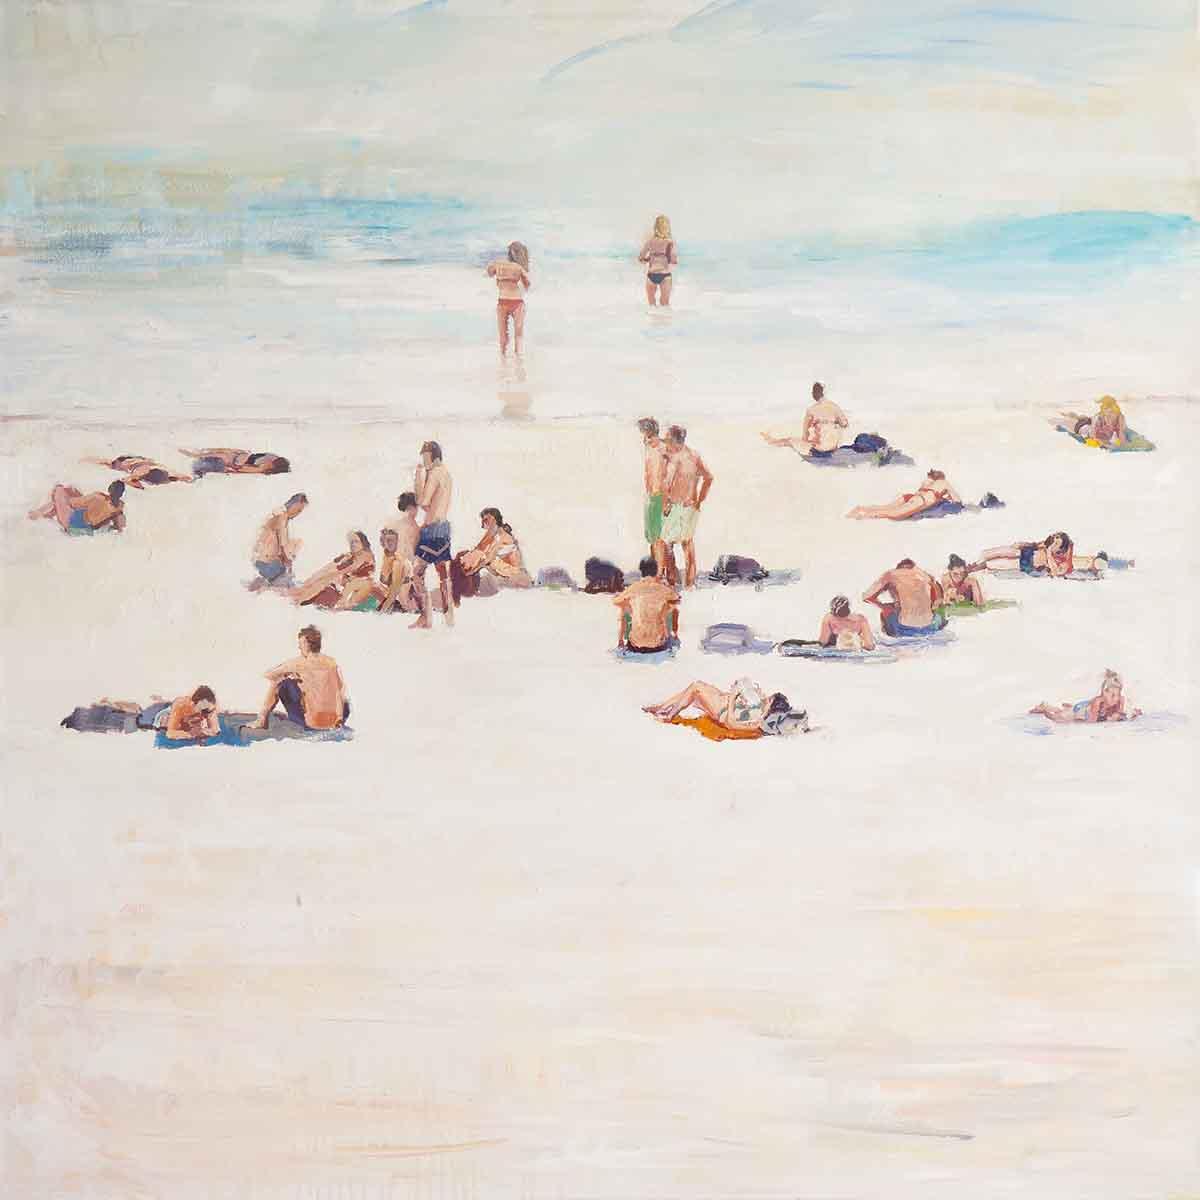 The Beach #5